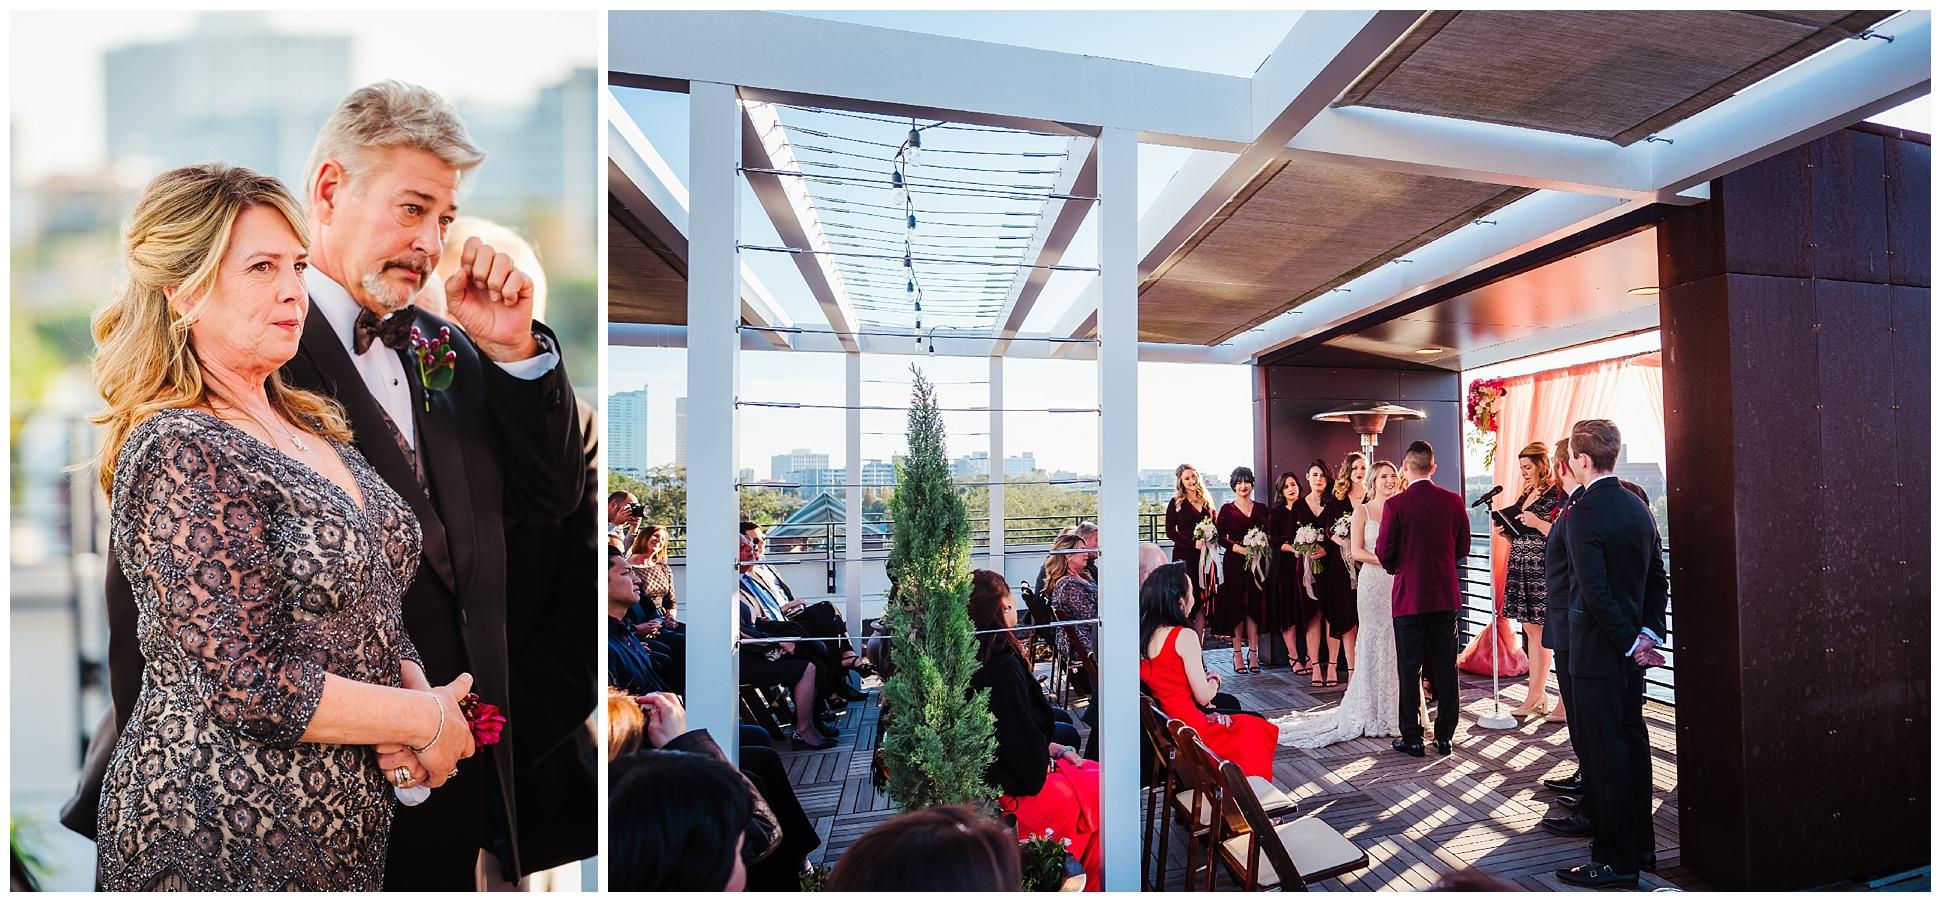 tampa-armeture-wedding-photographer-edgy-industrial-downtown-fancy-free-nursery-tattoo-burgandy-velvet_0047.jpg